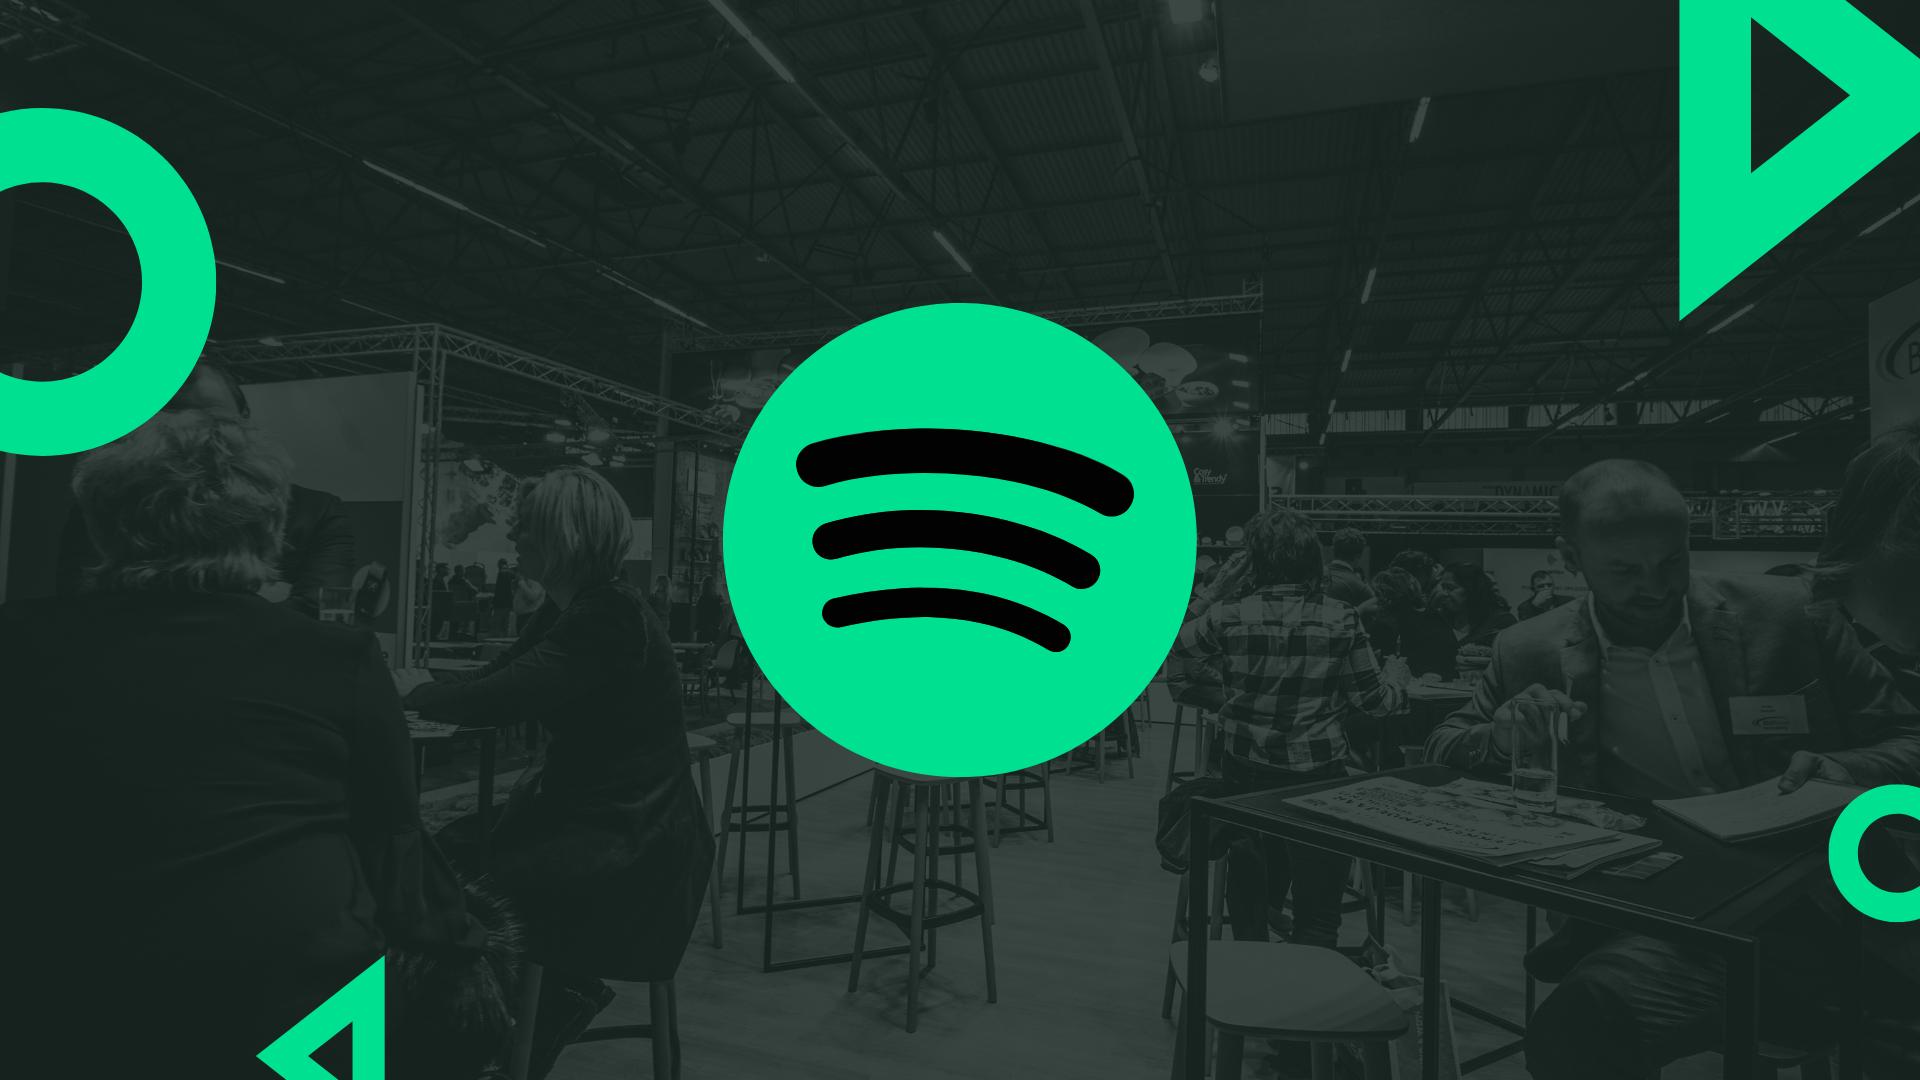 spotify-music-app-wallpaper-70110-72480-hd-wallpapers